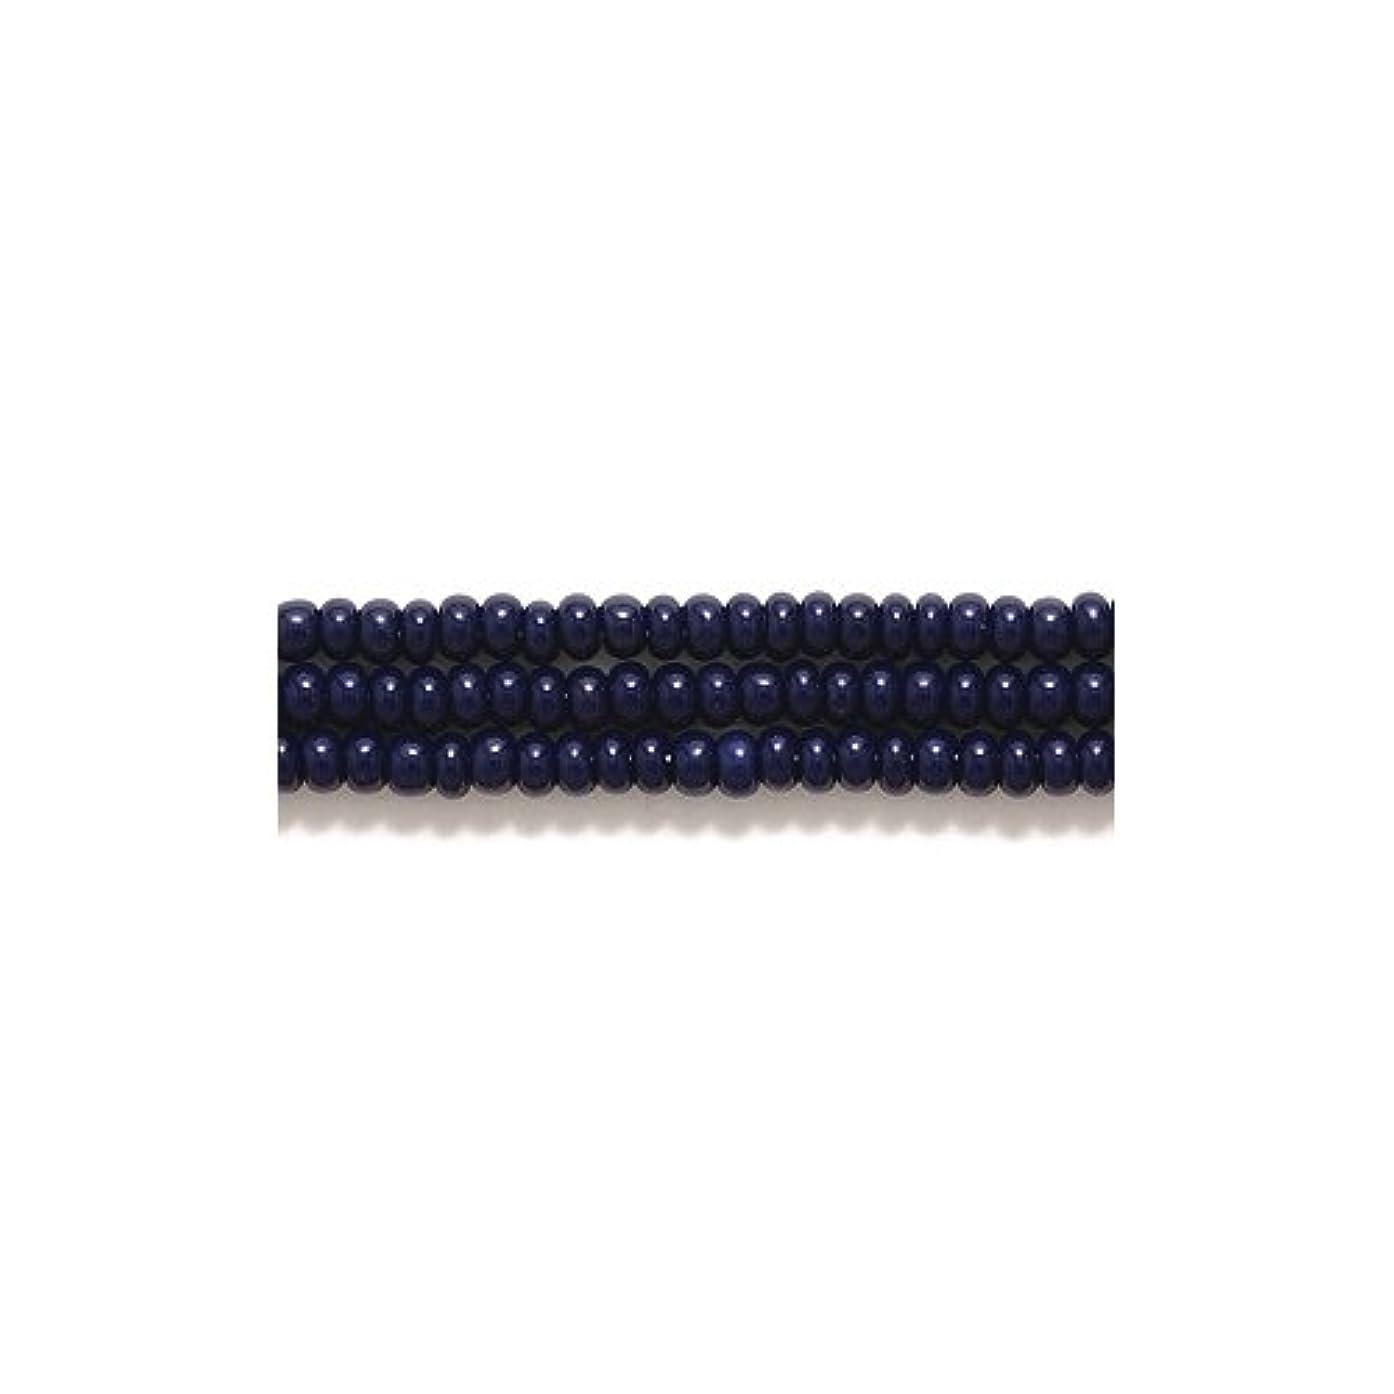 Preciosa Ornela Czech Seed Bead, Opaque Deep Navy Blue, Size 11/0 cbcy38139